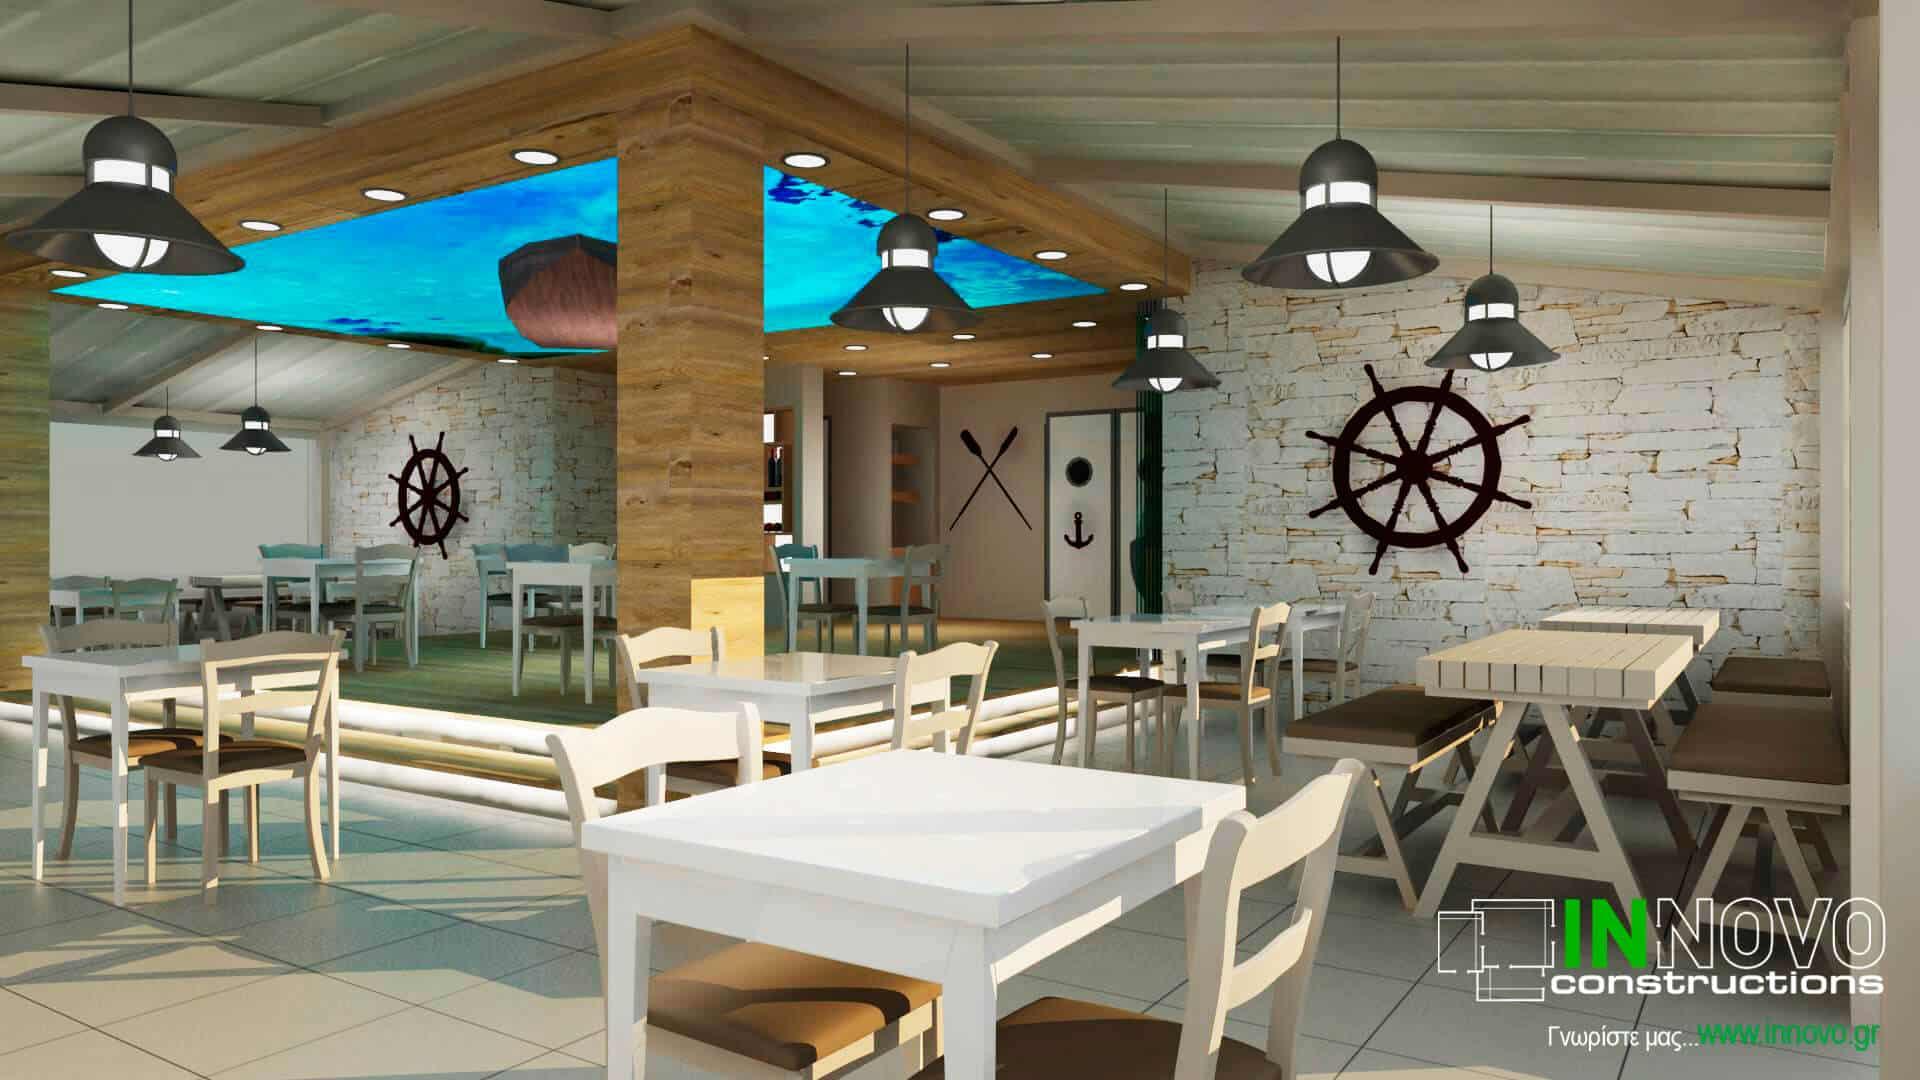 anakainisi-psitopoleiou-restaurant-renovation-psarotaverna-perissos-1414-10-1